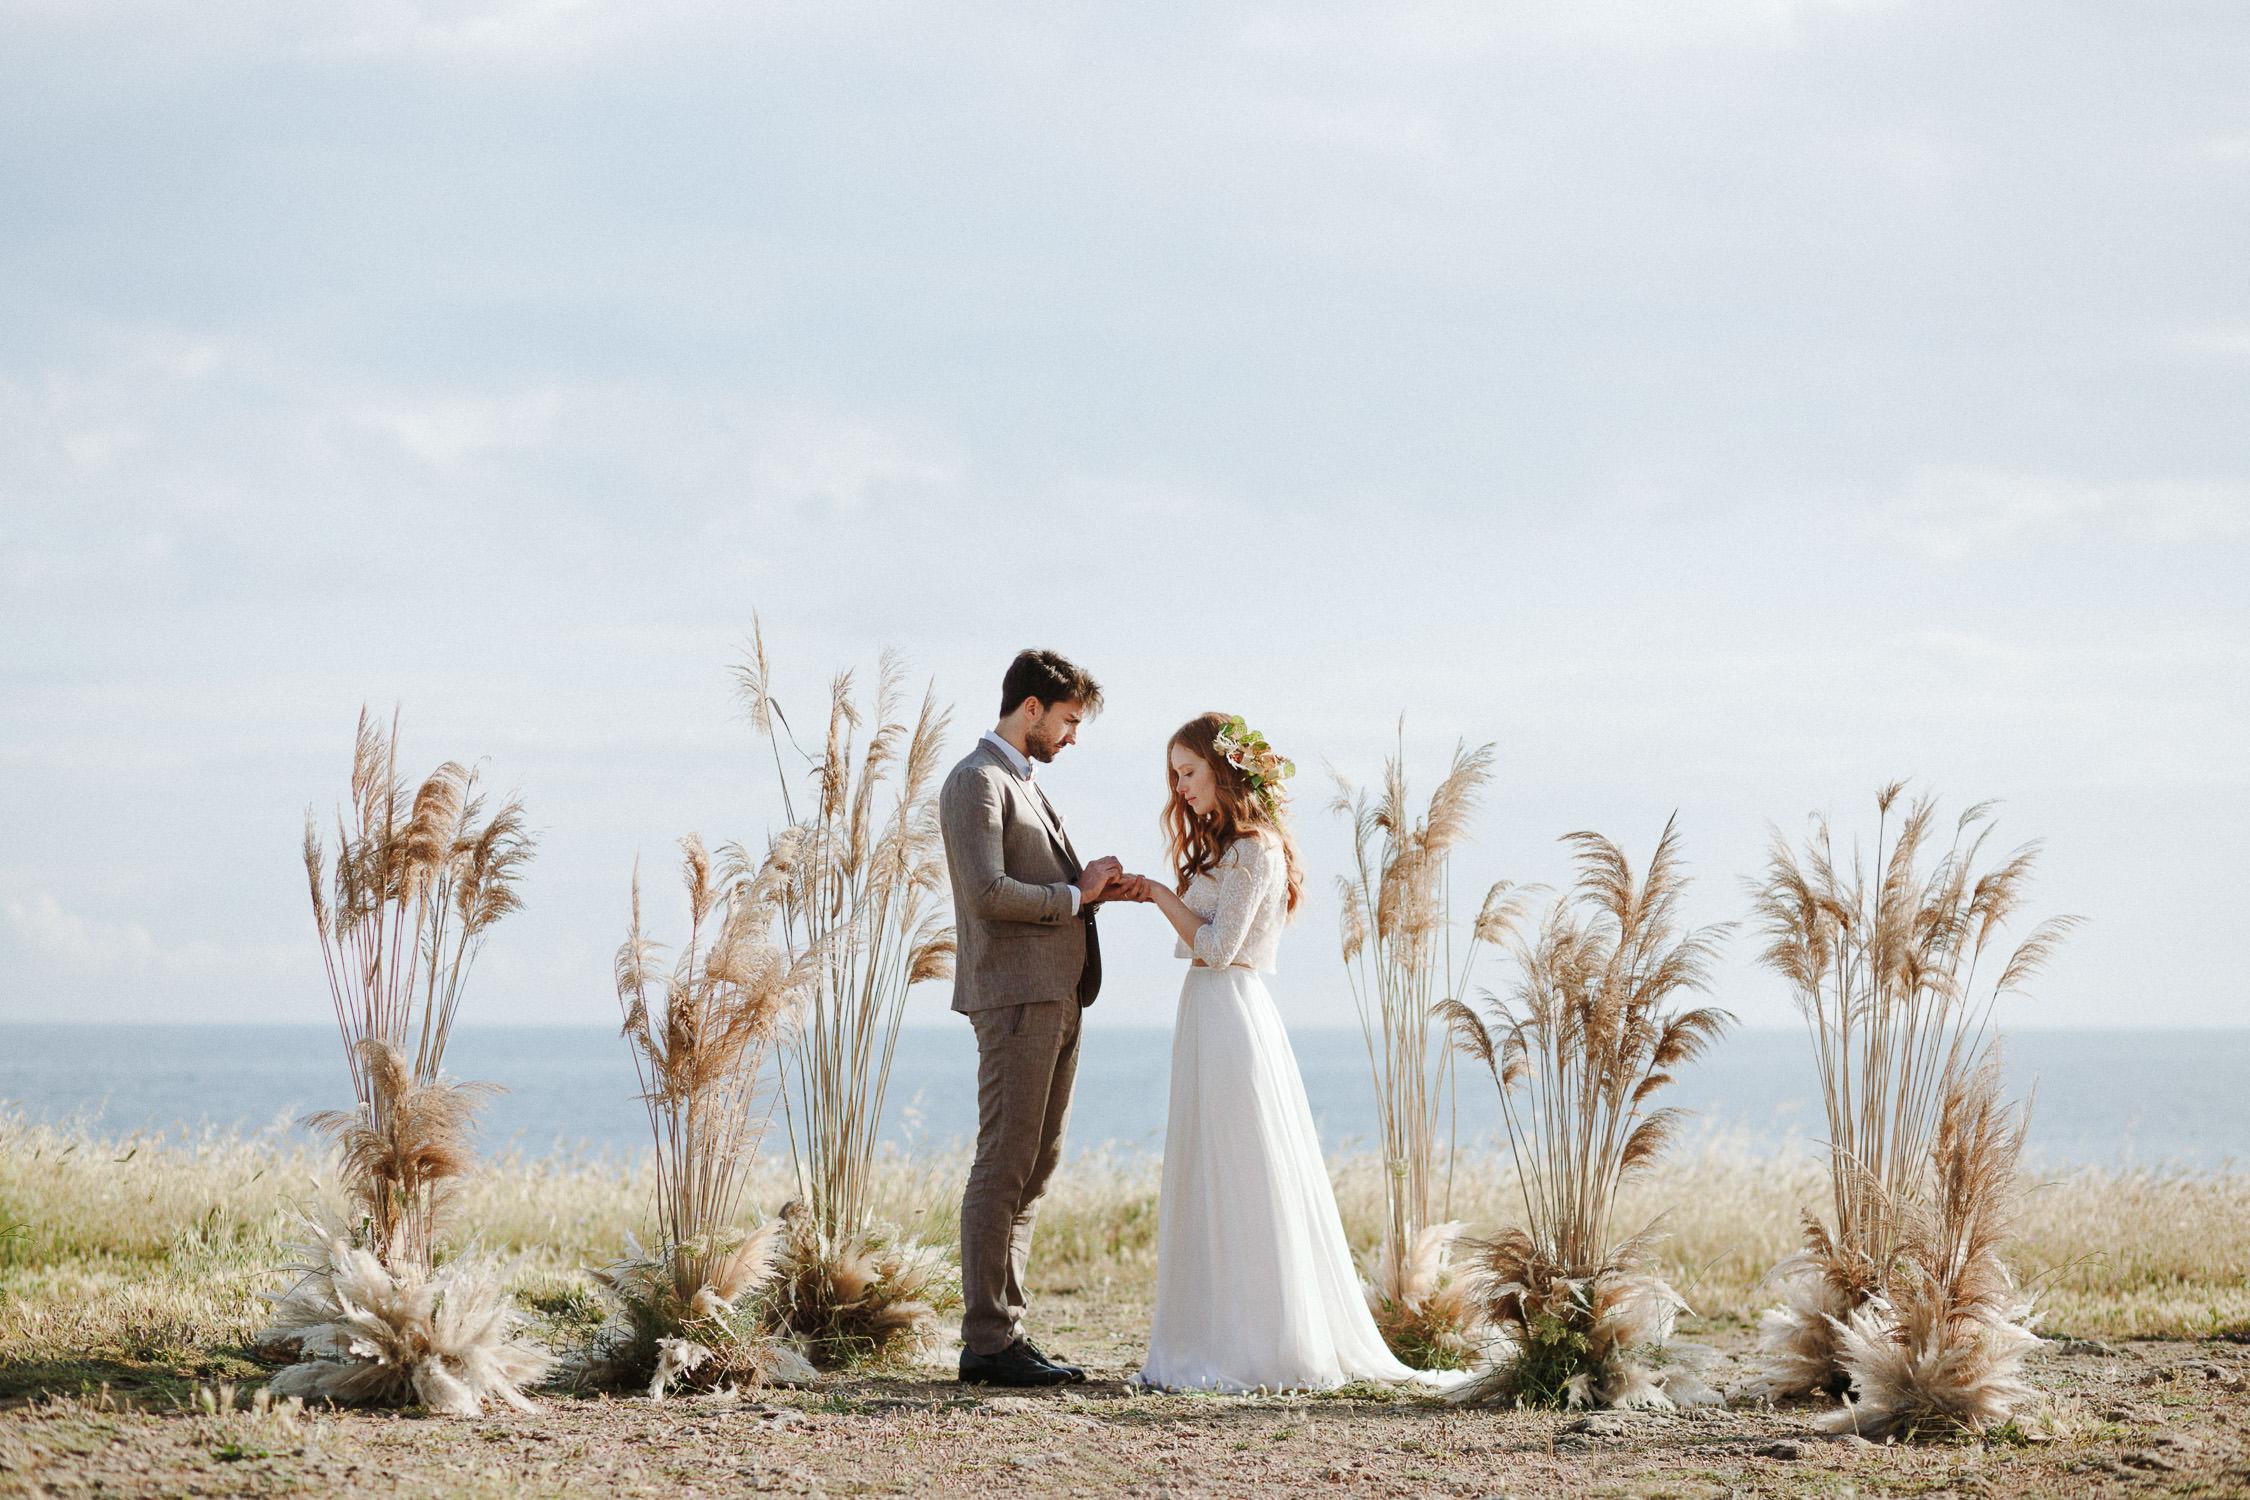 Italy-wedding-photographer-style05